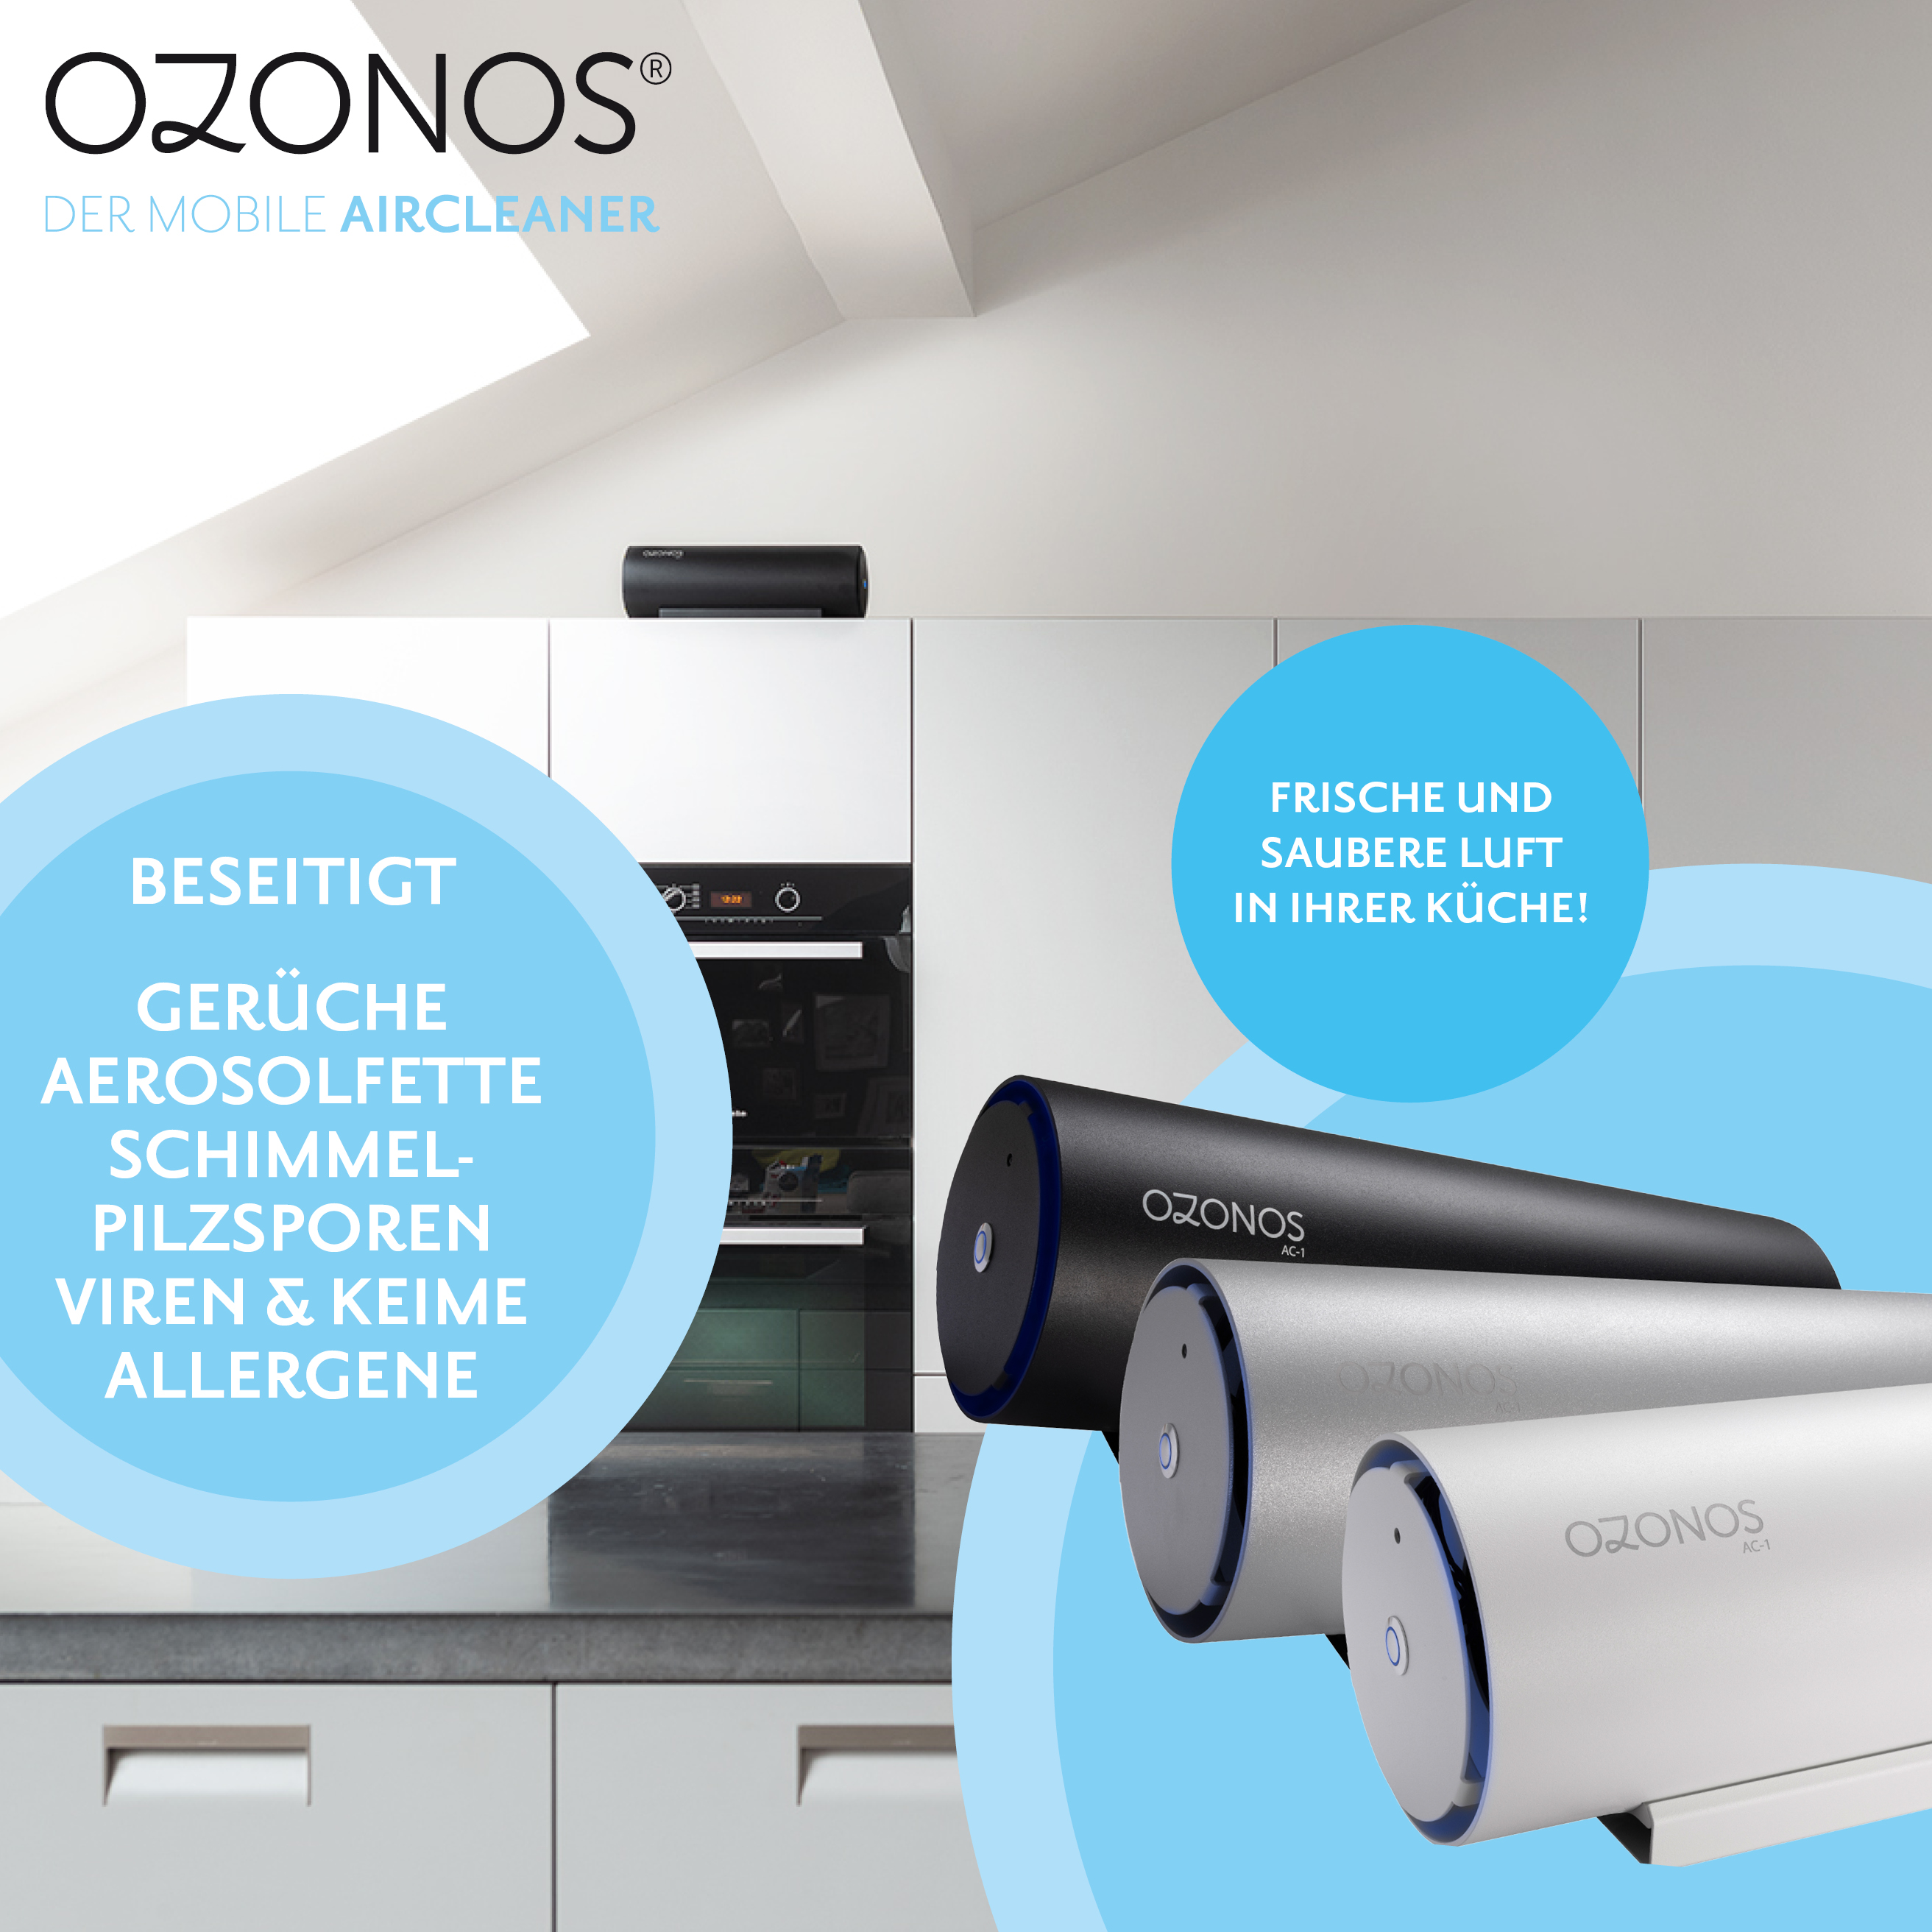 OZONOS Aircleaner